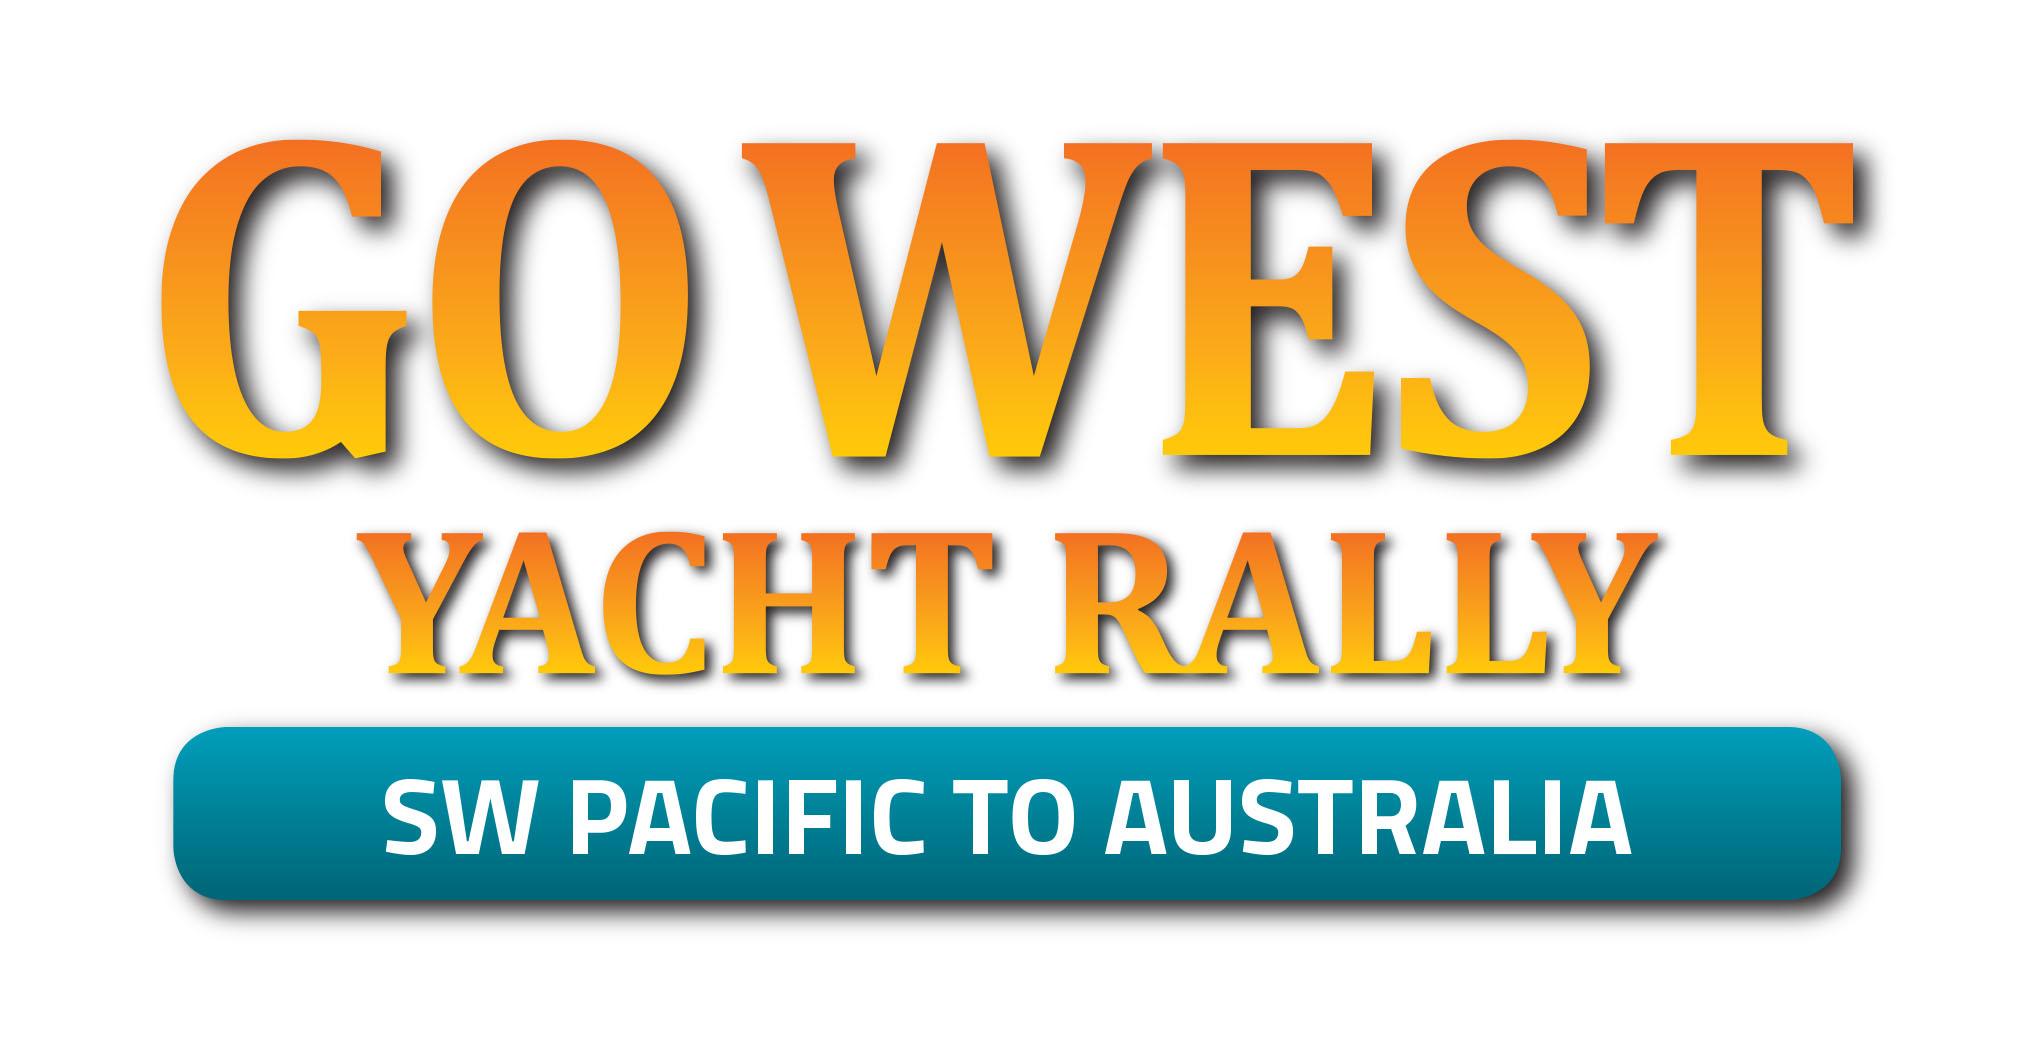 New Caledonia & Vanuatu to Australia - *Departs October/November